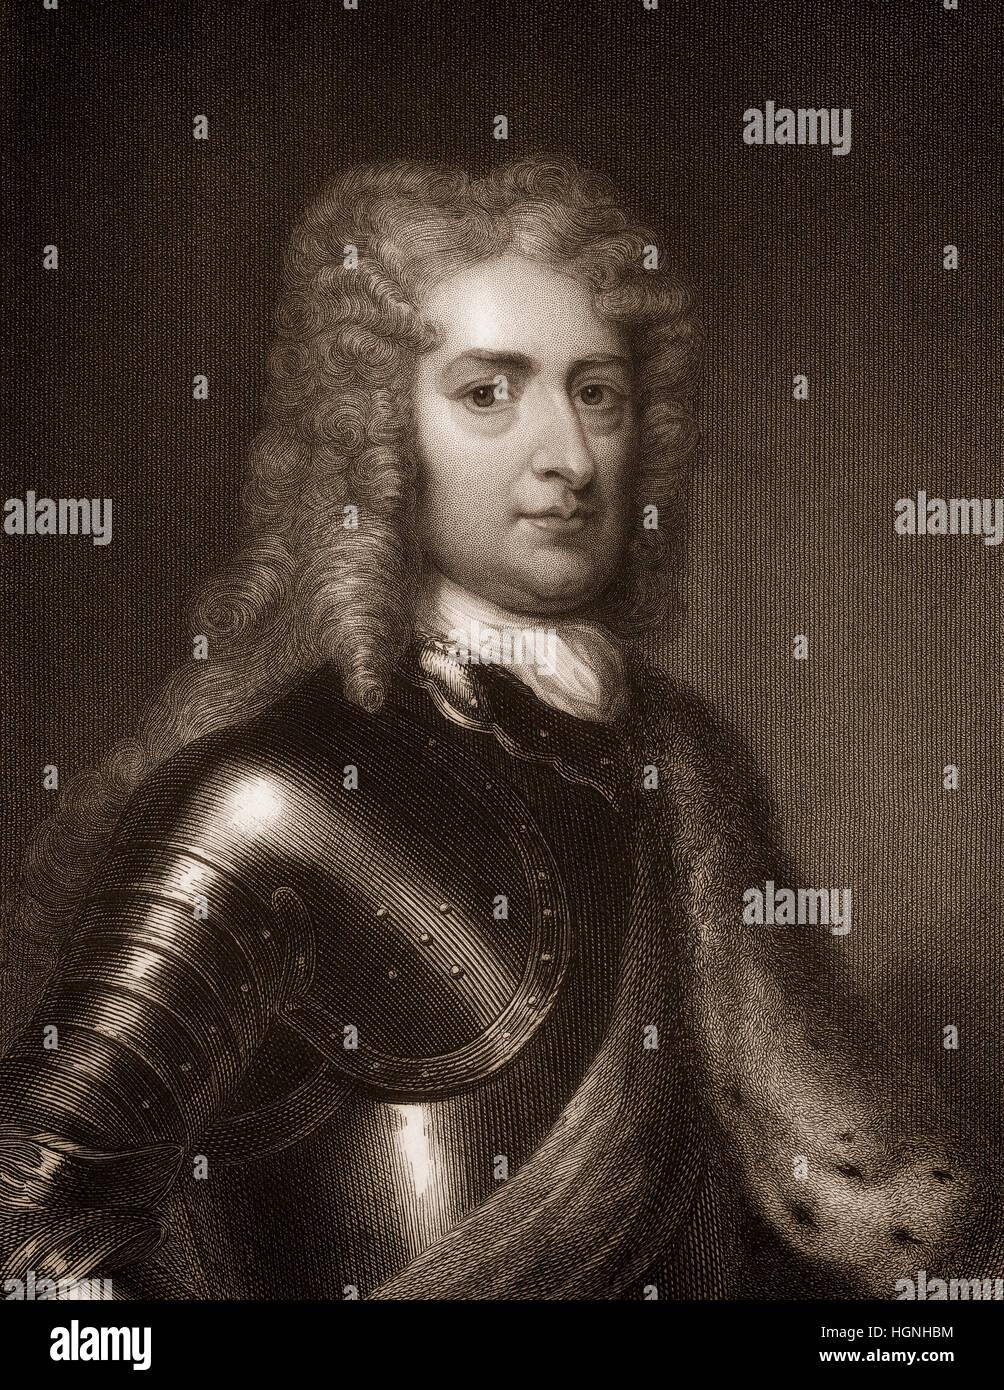 John Churchill, 1st Duke of Marlborough, 1650-1722, an English soldier and statesman - Stock Image